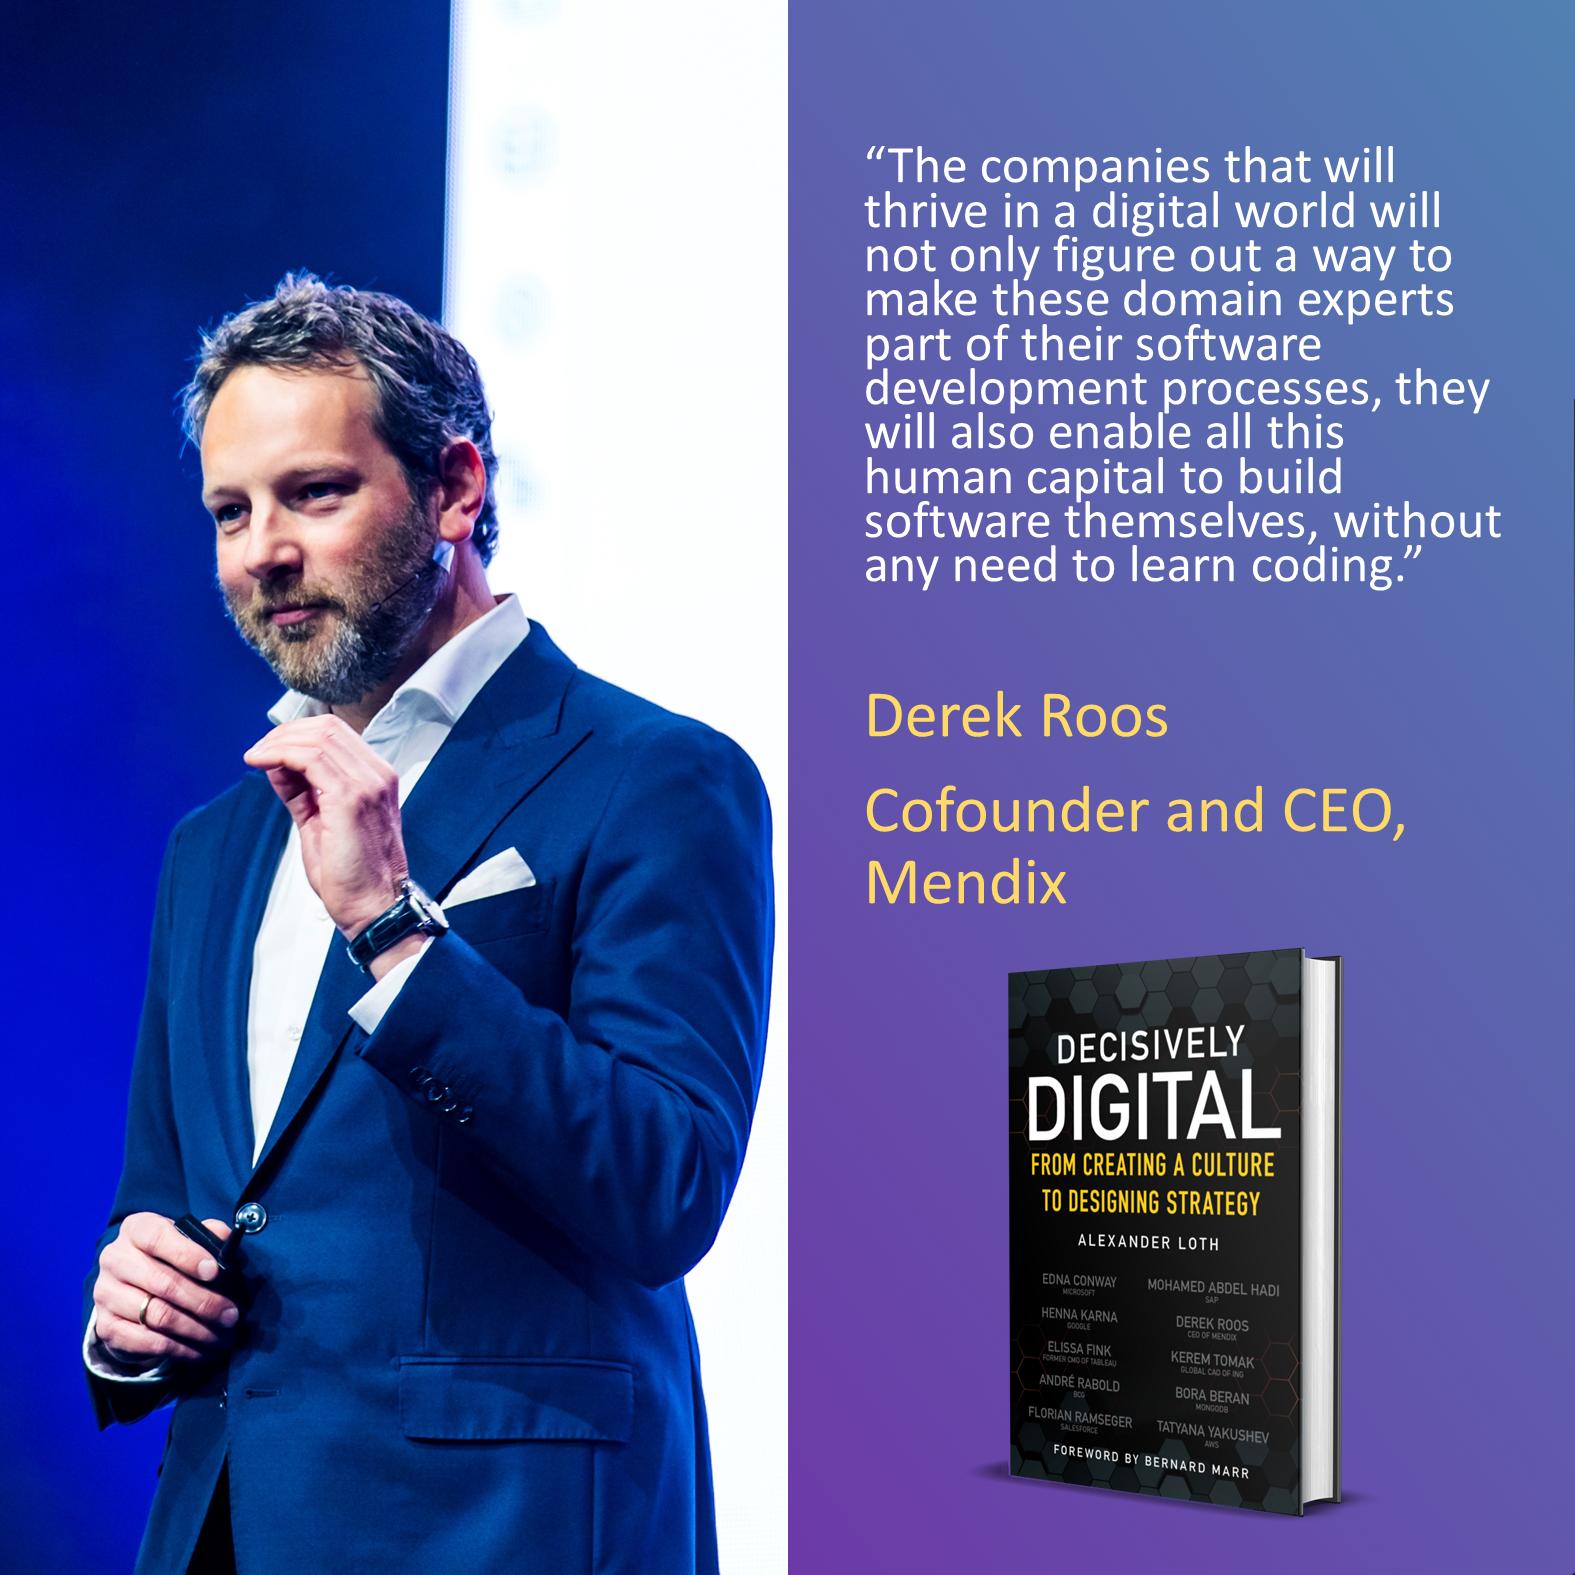 Derek Roos, Cofounder and CEO of Mendix